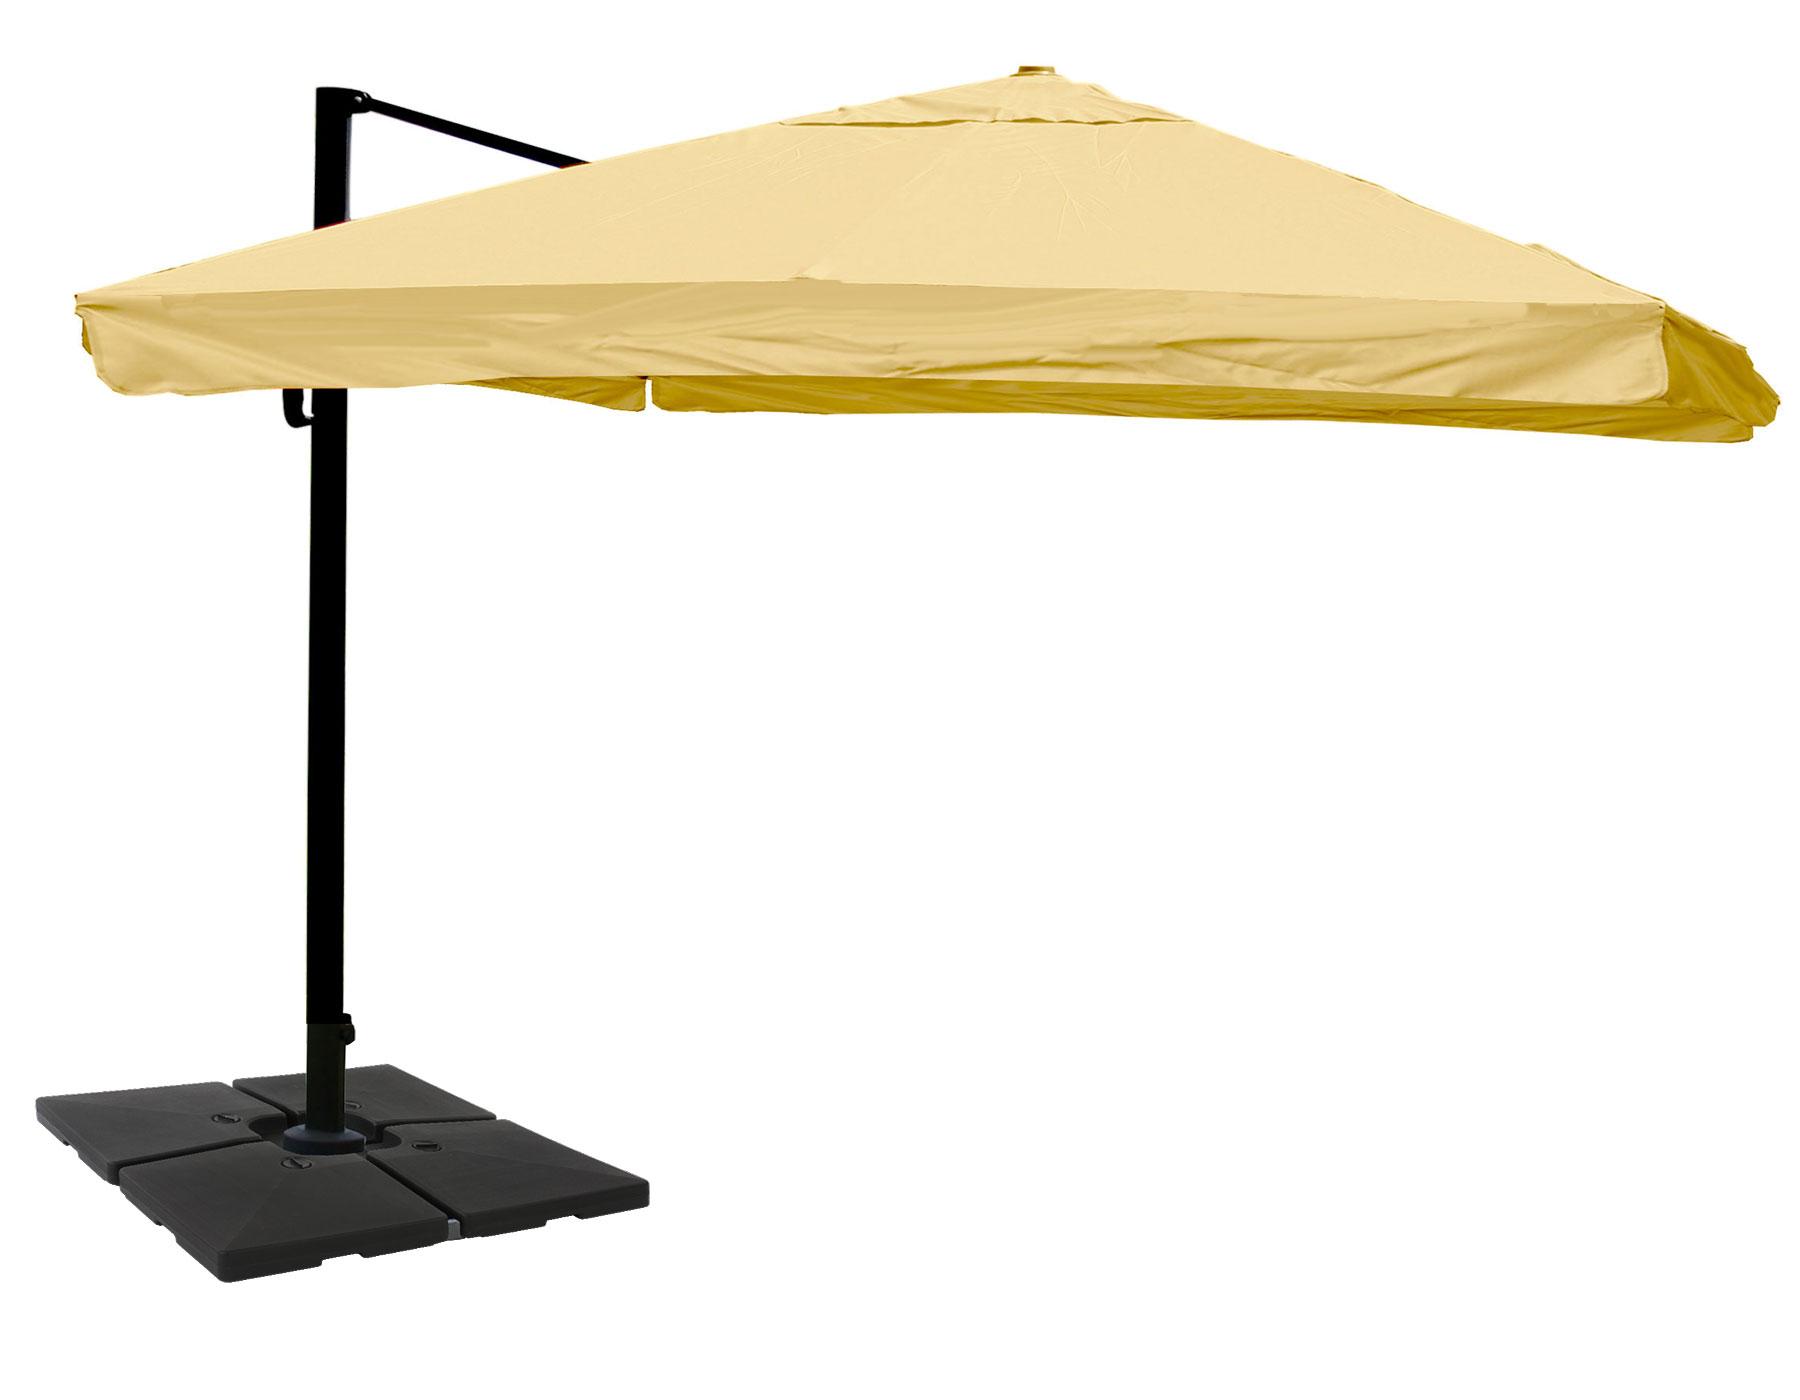 gastronomie ampelschirm hwc a96 sonnenschirm 3x4m 5m polyester alu 26kg flap creme mit. Black Bedroom Furniture Sets. Home Design Ideas